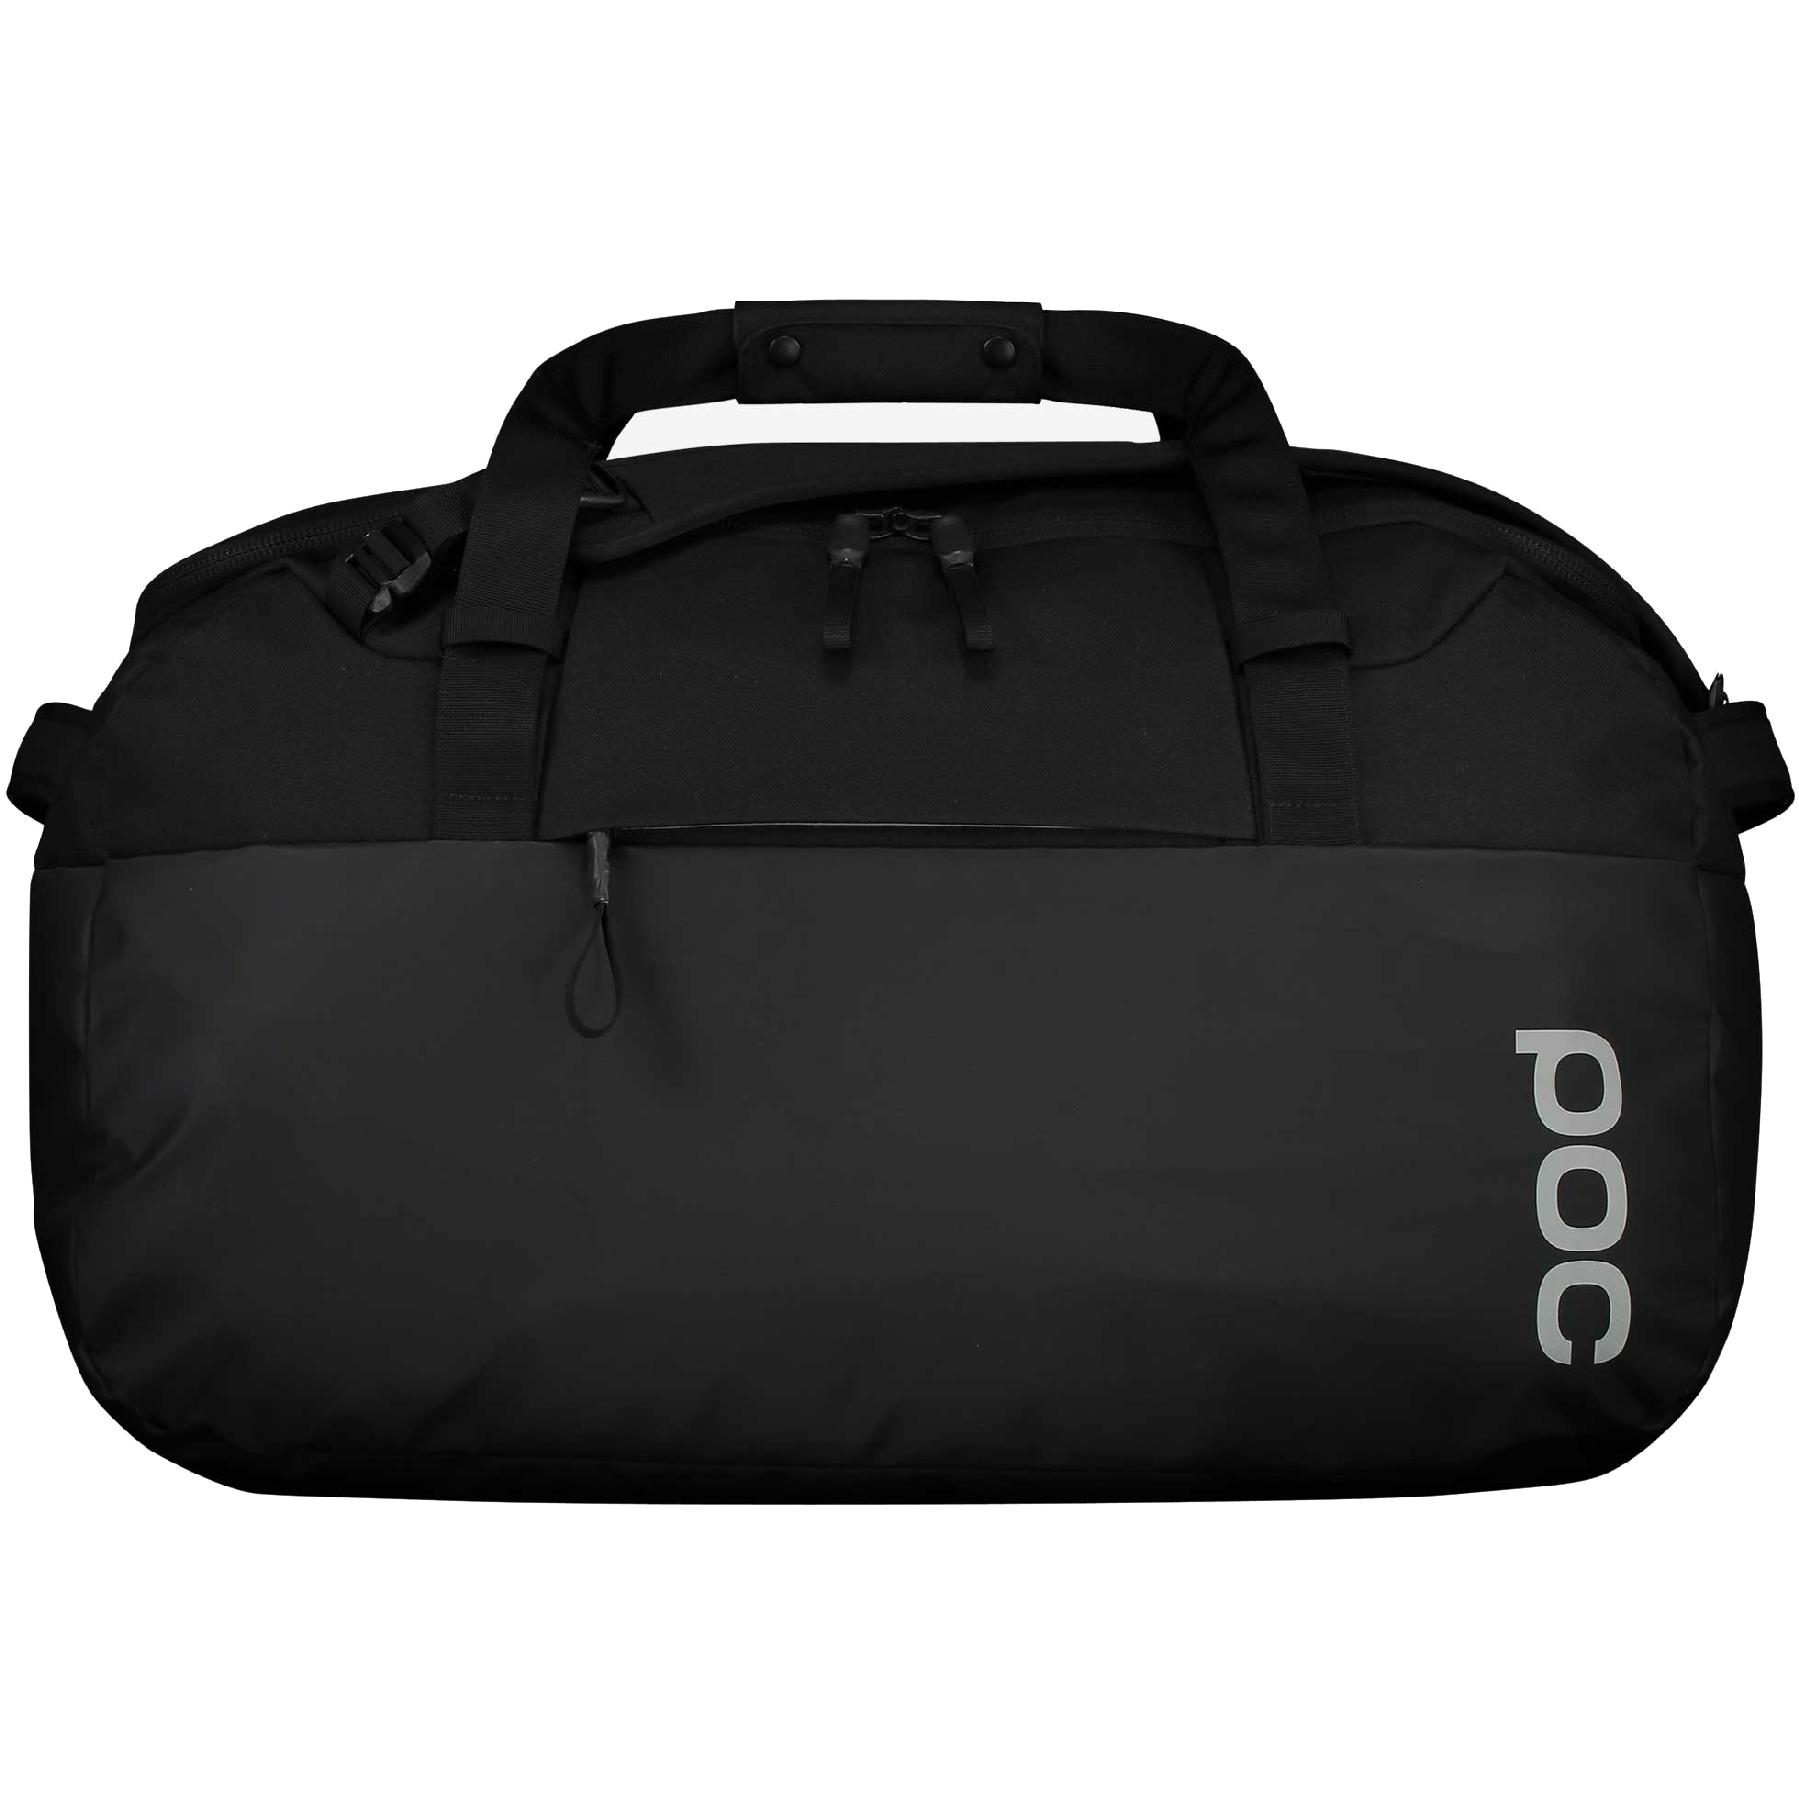 Produktbild von POC Duffel Bag 80L - Uranium Black